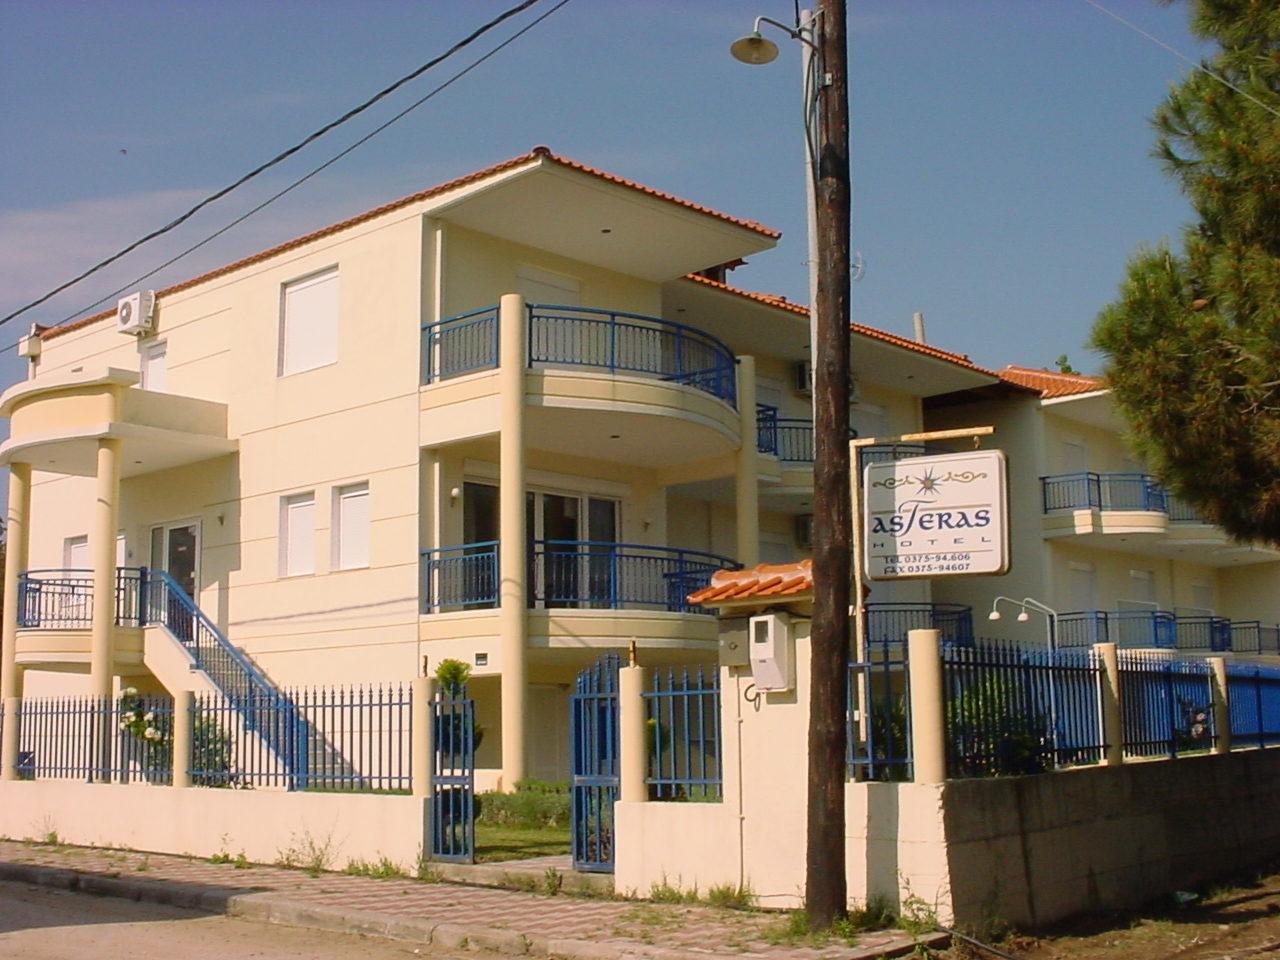 Sarti, Asteras Hotel 2005